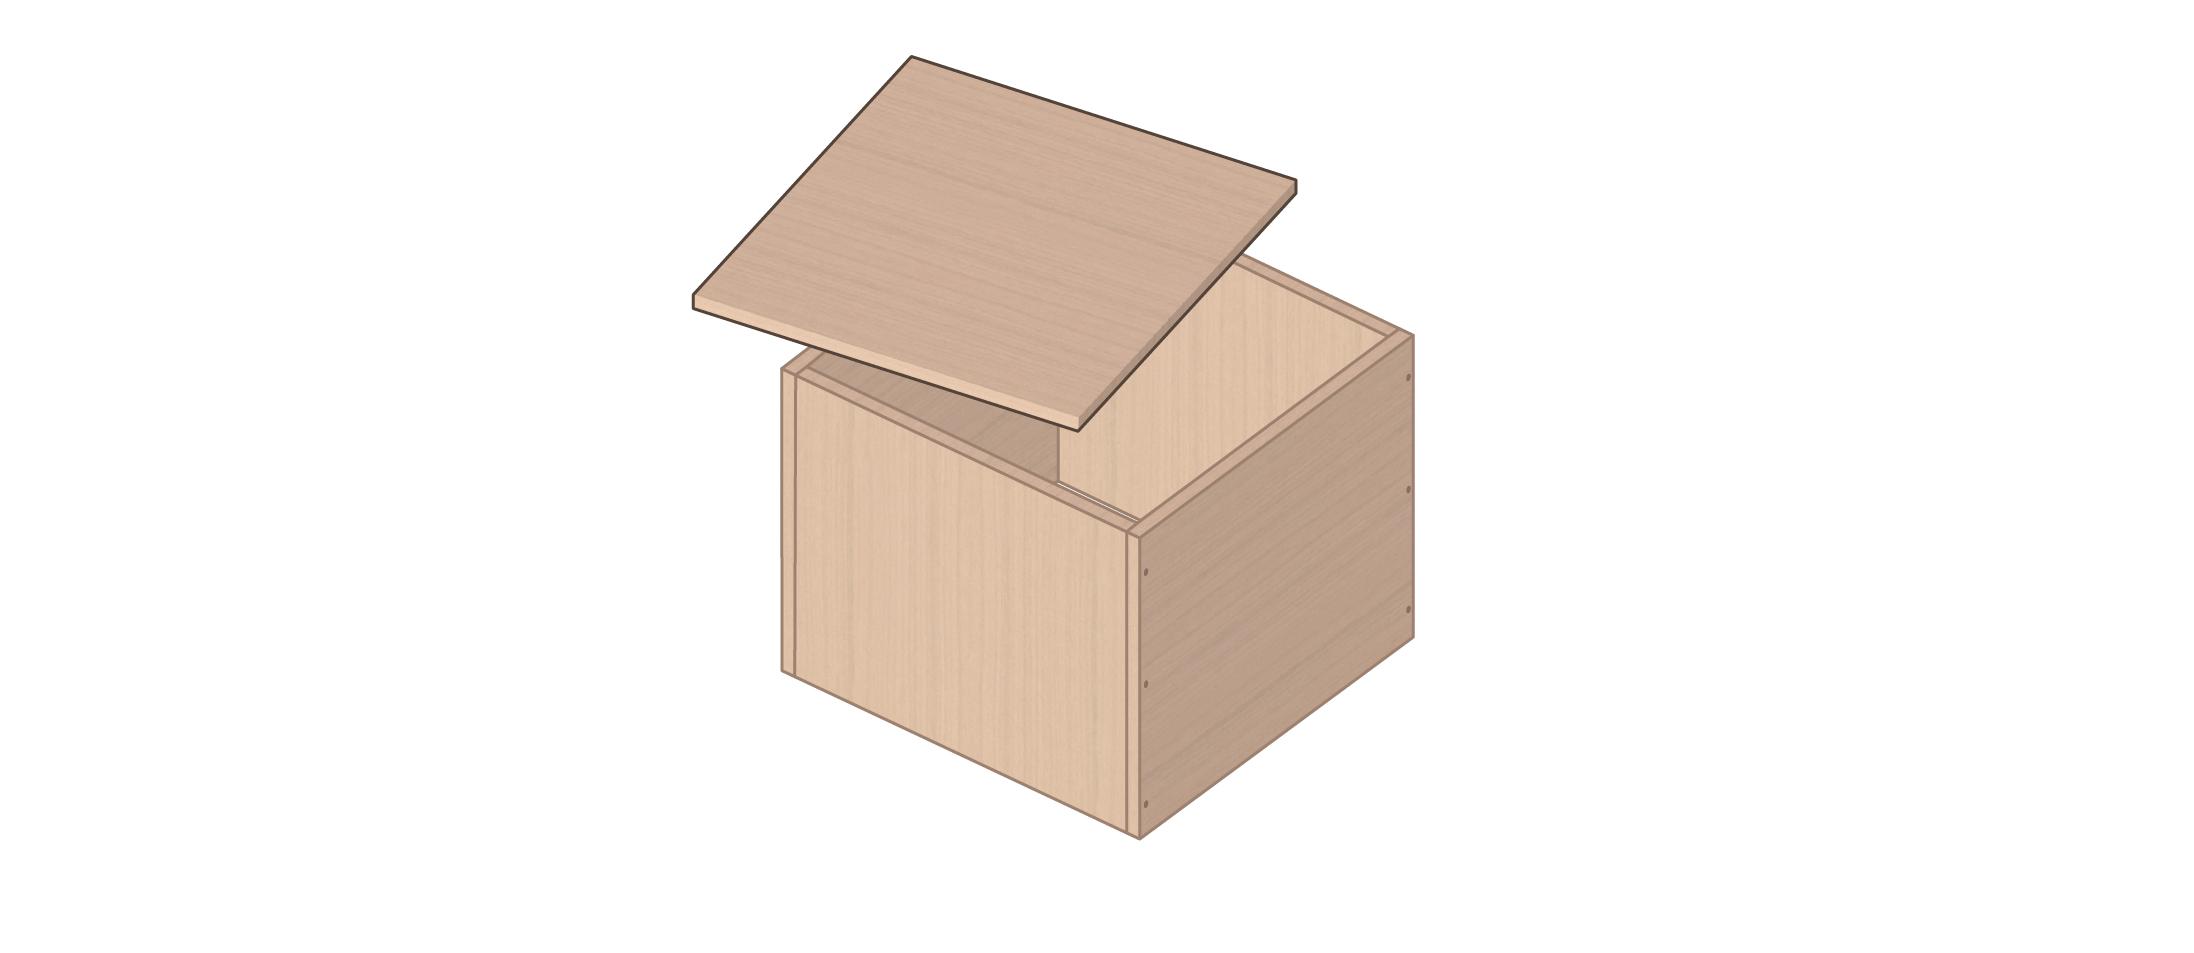 meuble vinyle DIY étape 4